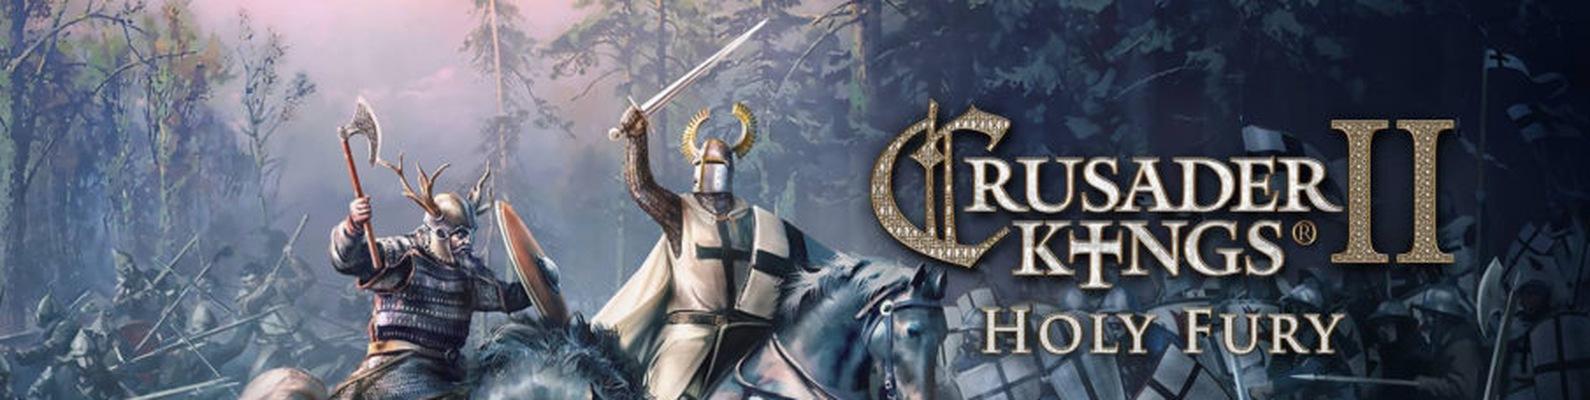 Crusader kings 2 holy fury скачать торрент